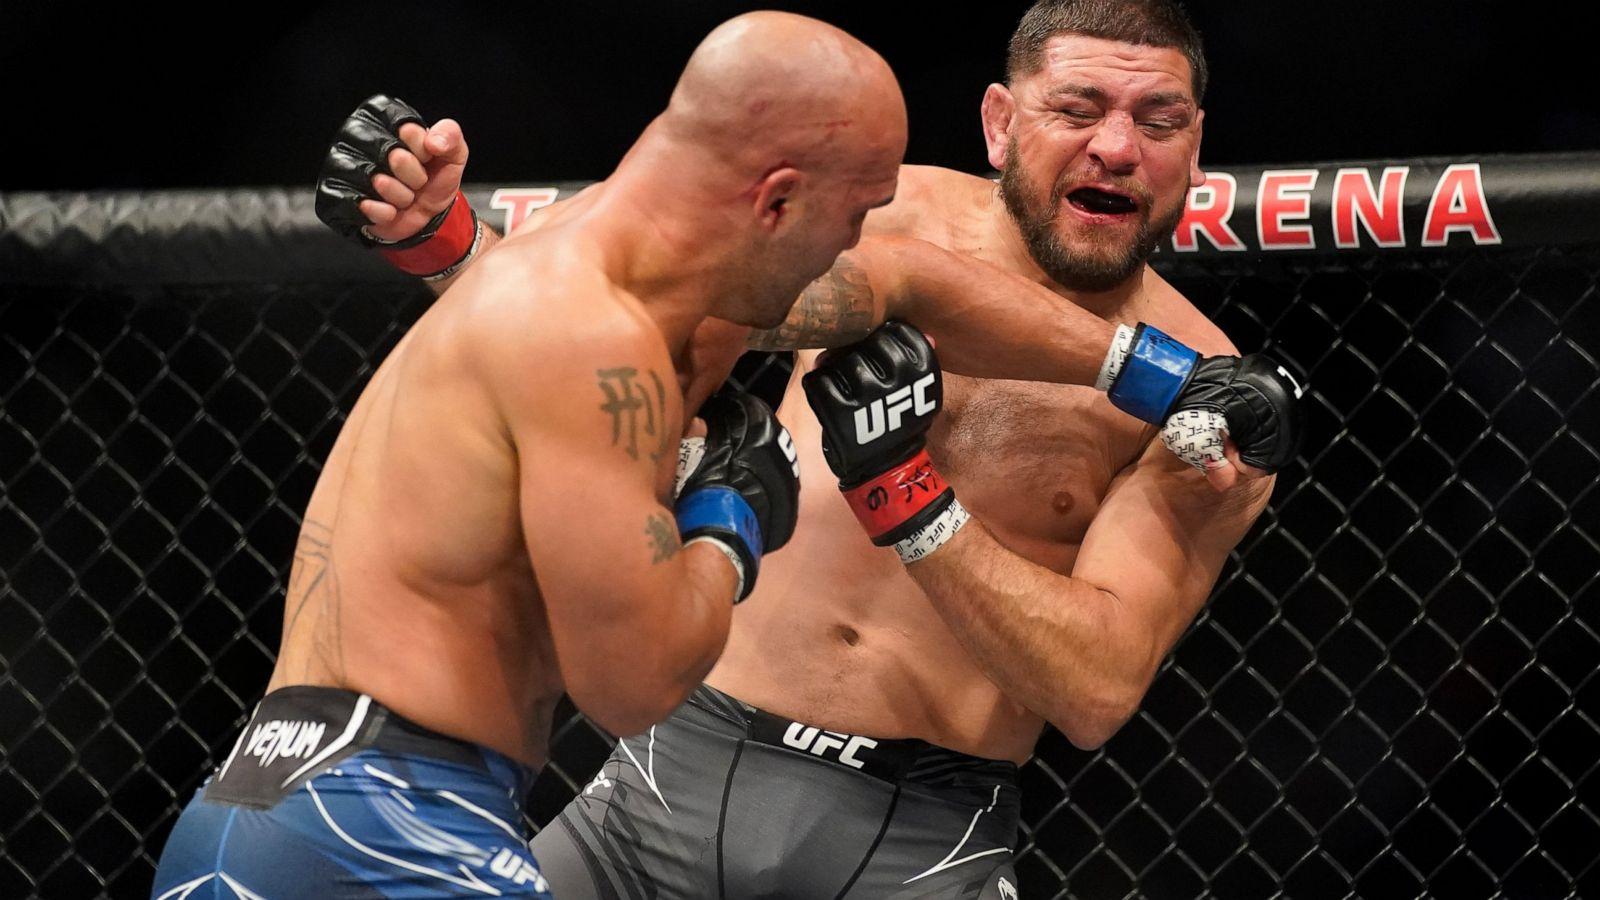 Volkanovski, Shevchenko defend at UFC 266; Lawler stops Diaz - ABC News